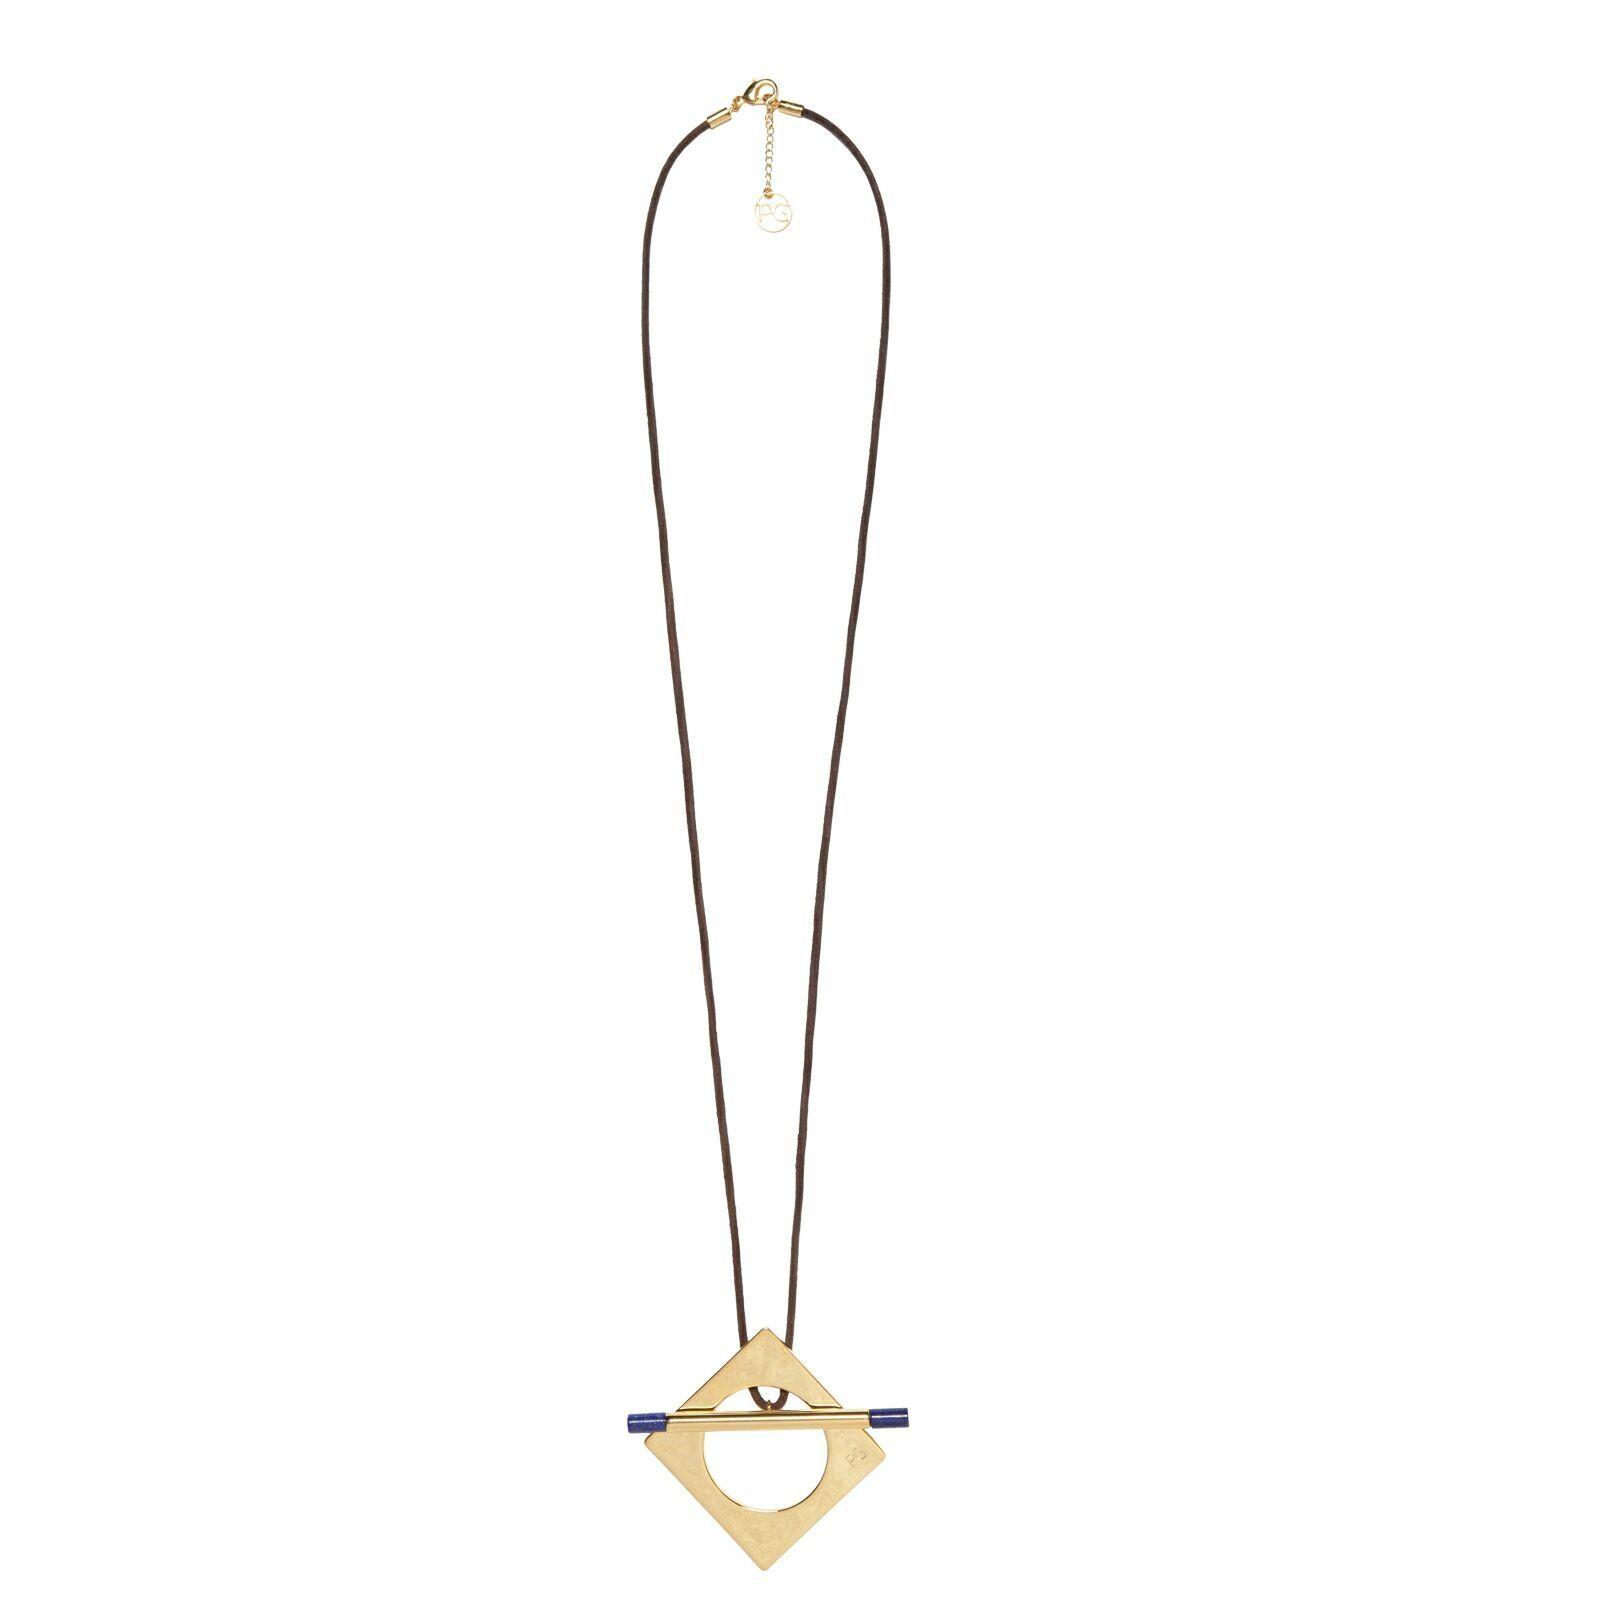 http://www.purificaciongarcia.com/uk/woman/woman-jewelry/item/lapis-necklace.html